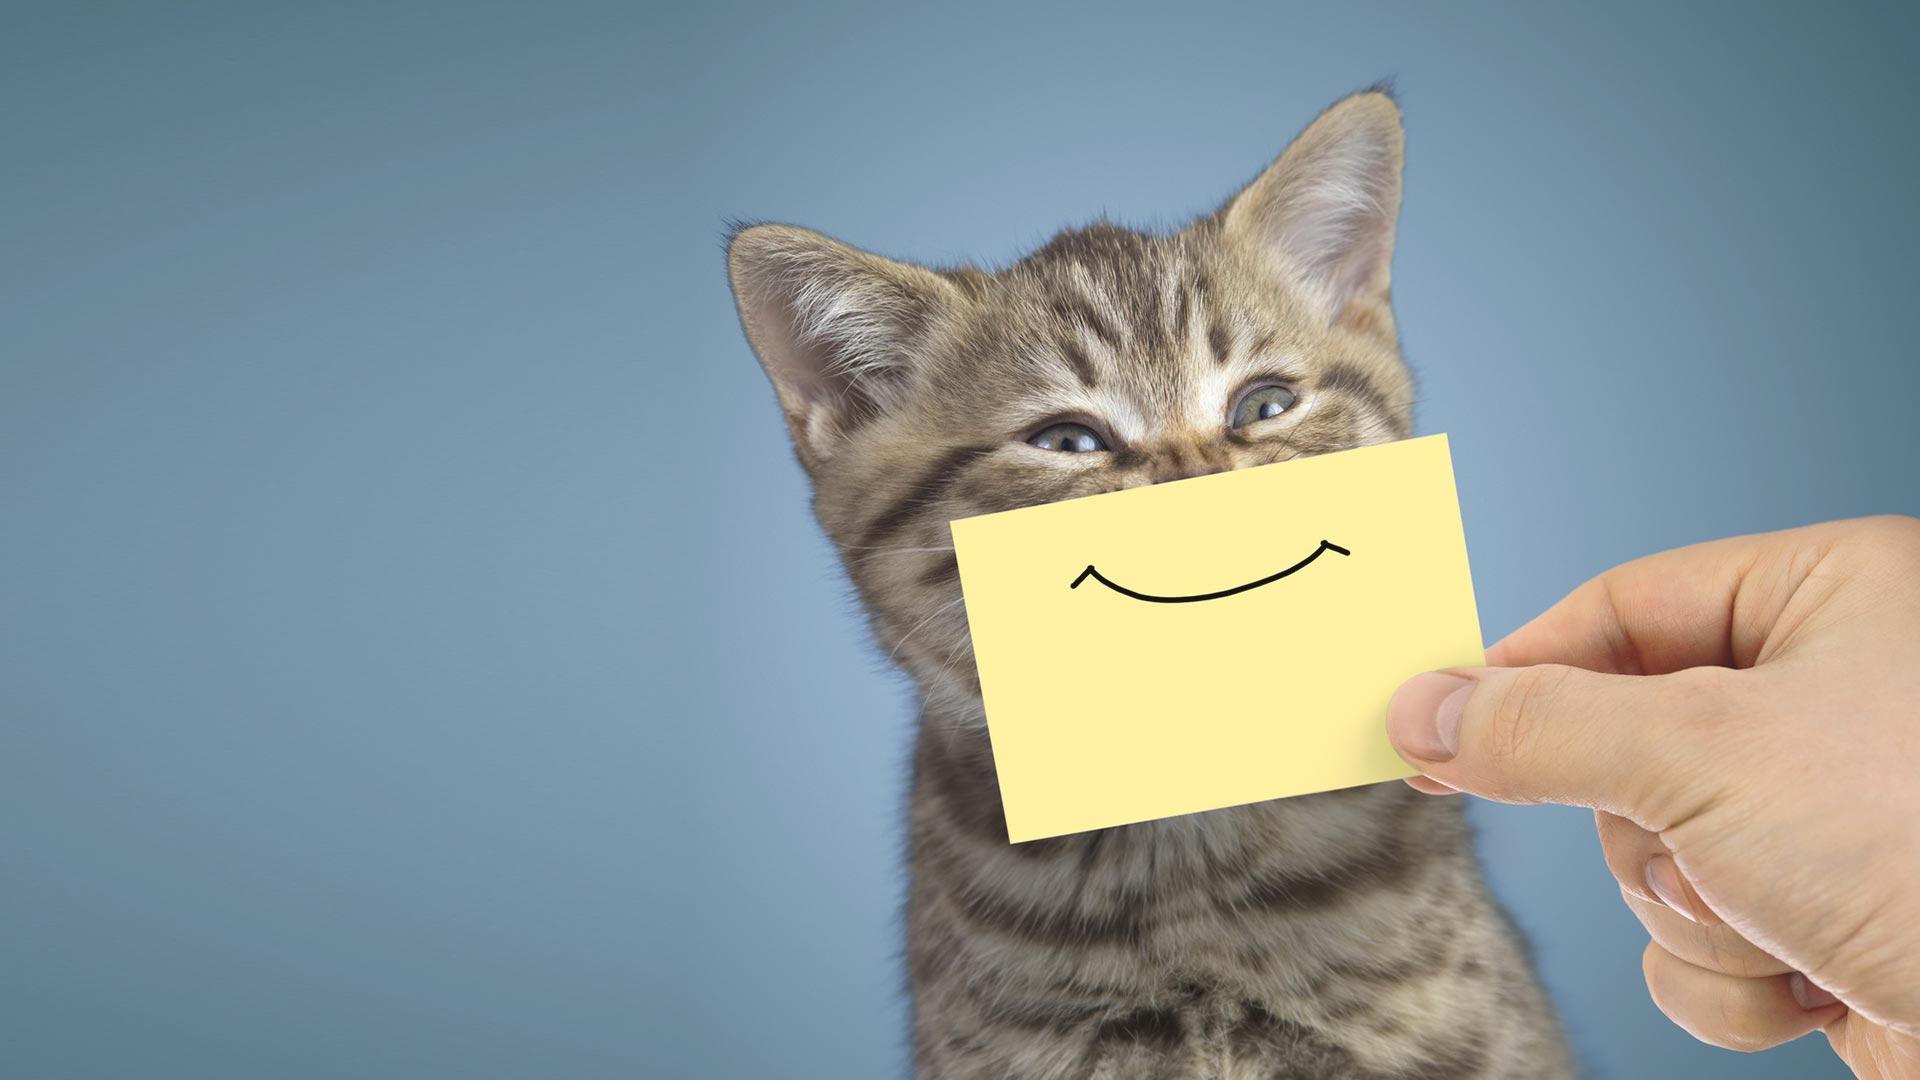 Pfotentafel – 10 Tonnen Katzenfutter eingetroffen